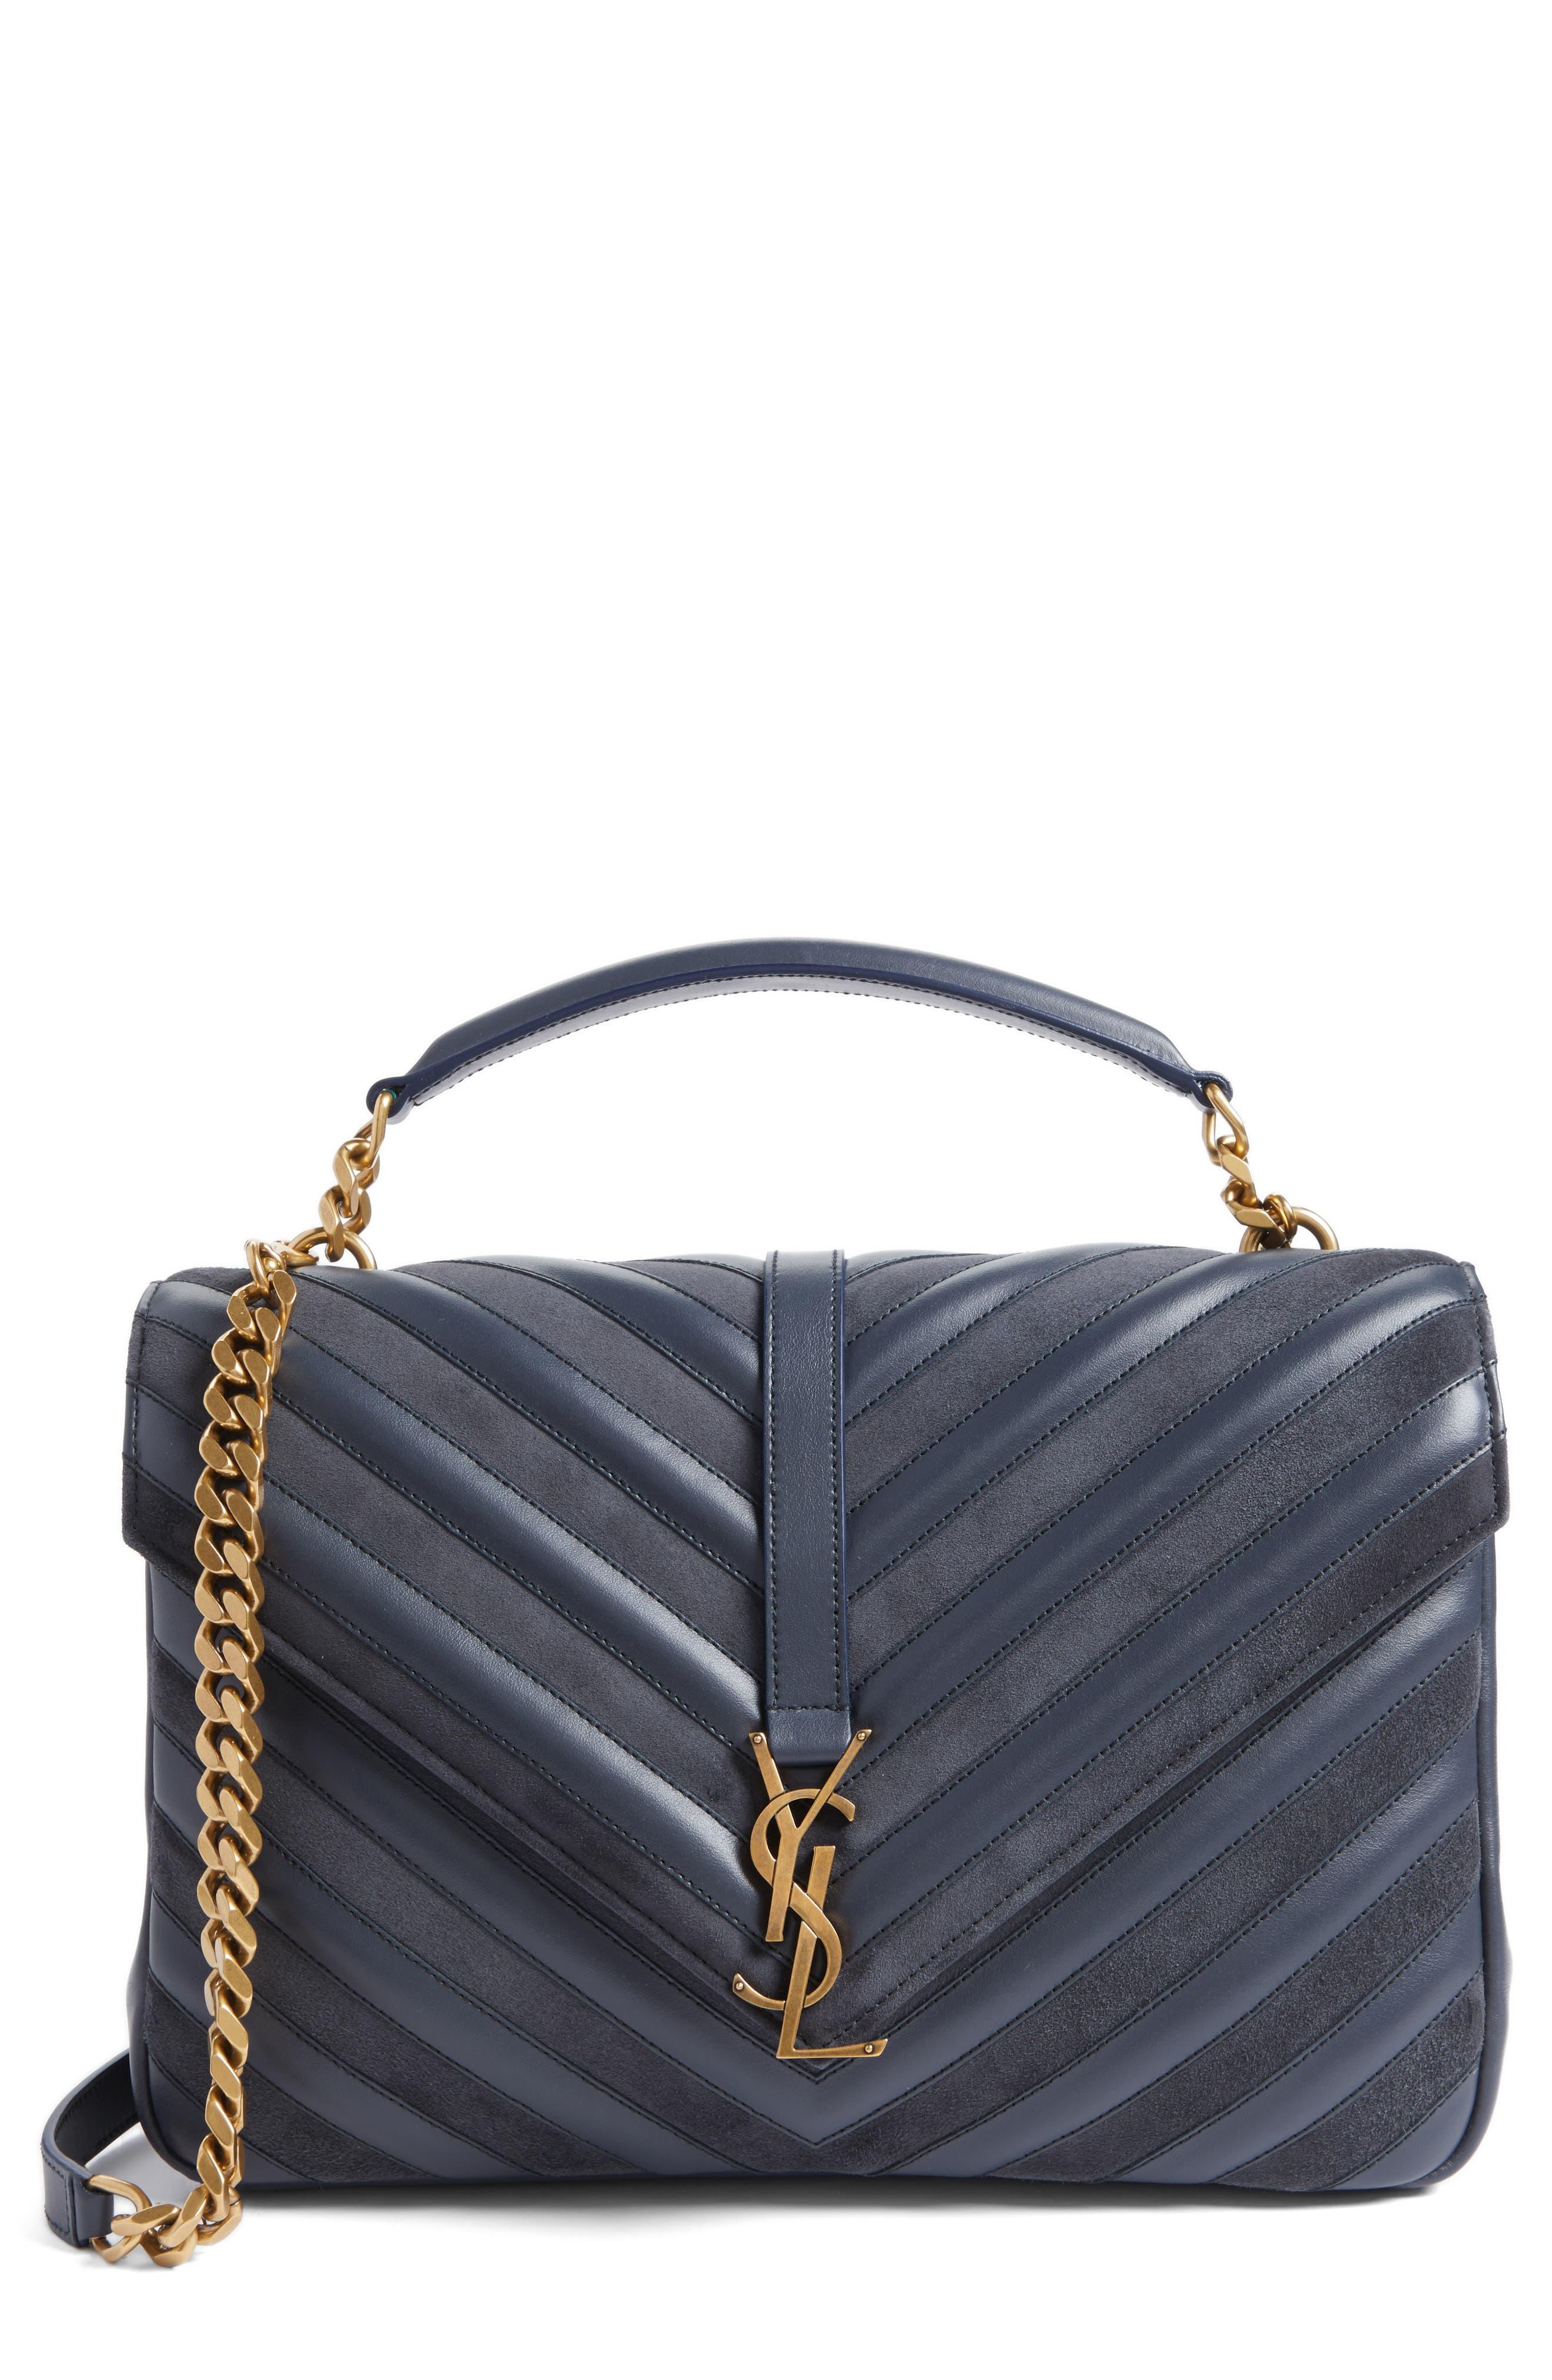 Medium College Patchwork Suede & Leather Shoulder Bag,                             Main thumbnail 1, color,                             020